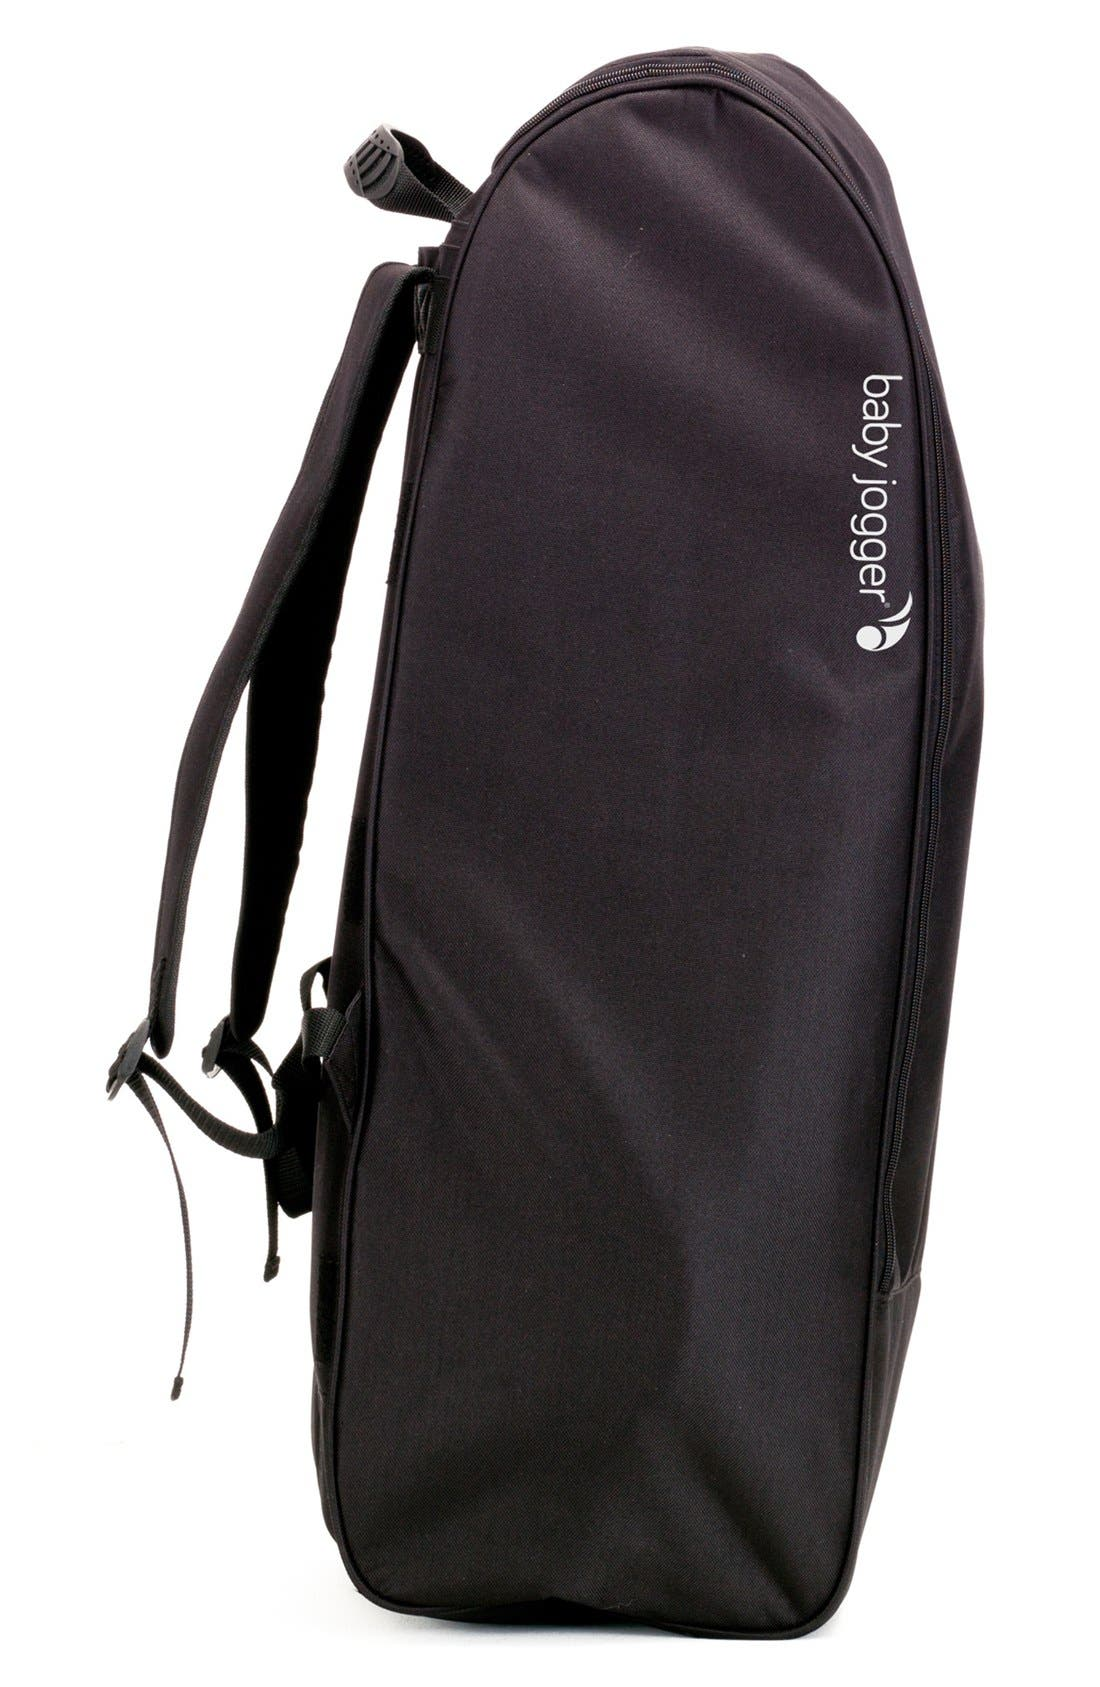 Main Image - Baby Jogger 'City Mini® ZIP' Stroller Backpack Carry Bag